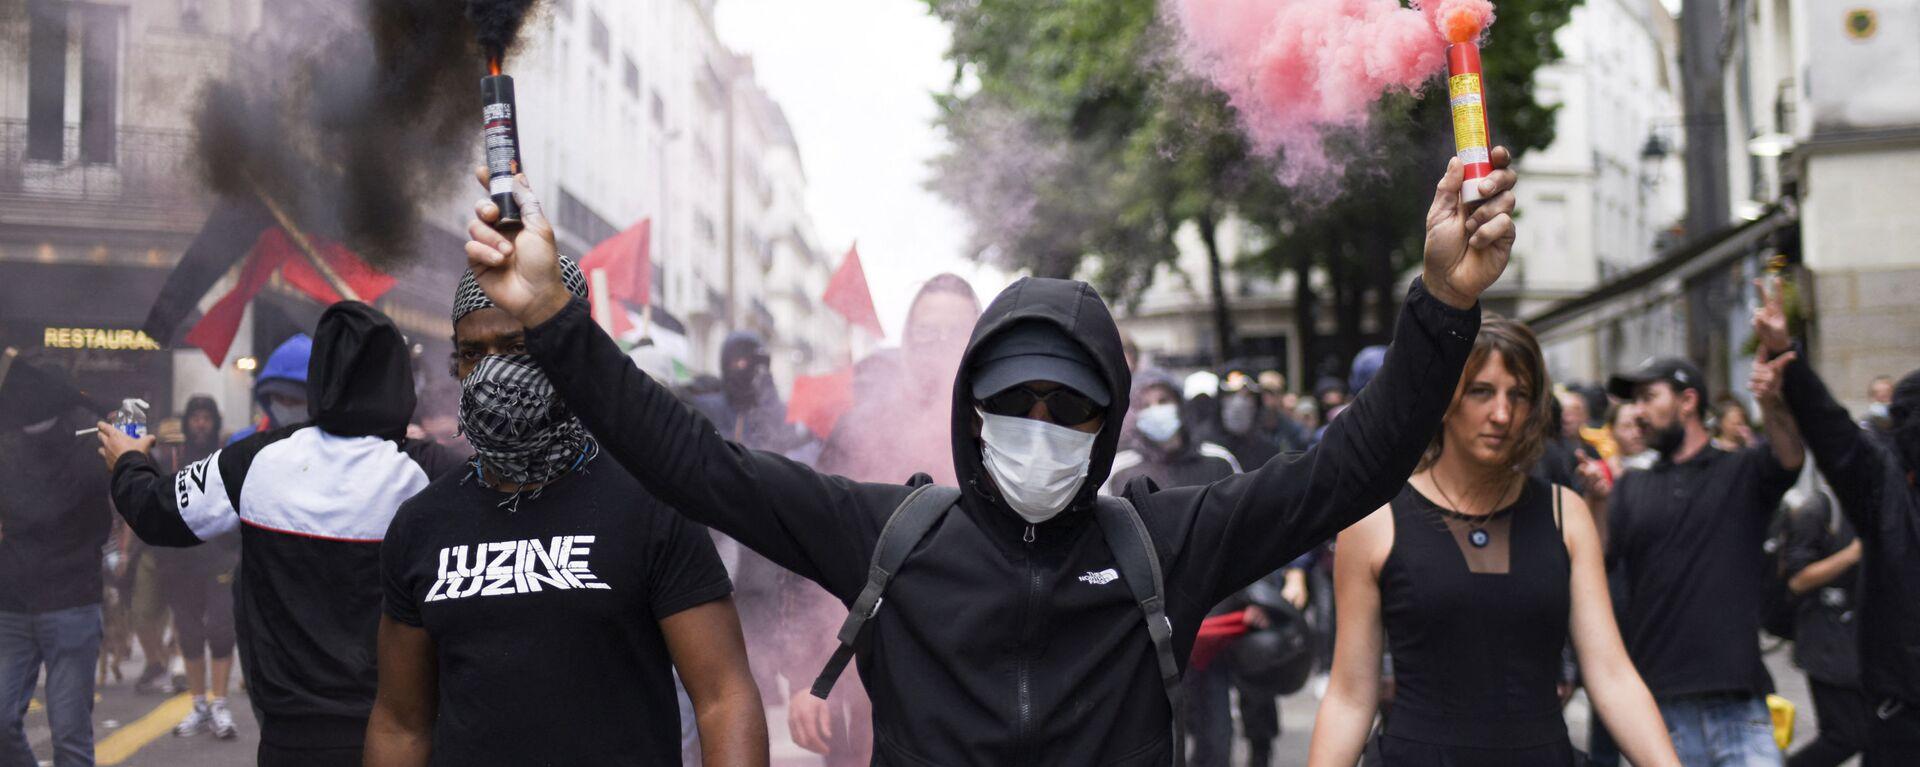 Manifestazioni No Green Pass in Francia - Sputnik Italia, 1920, 09.10.2021